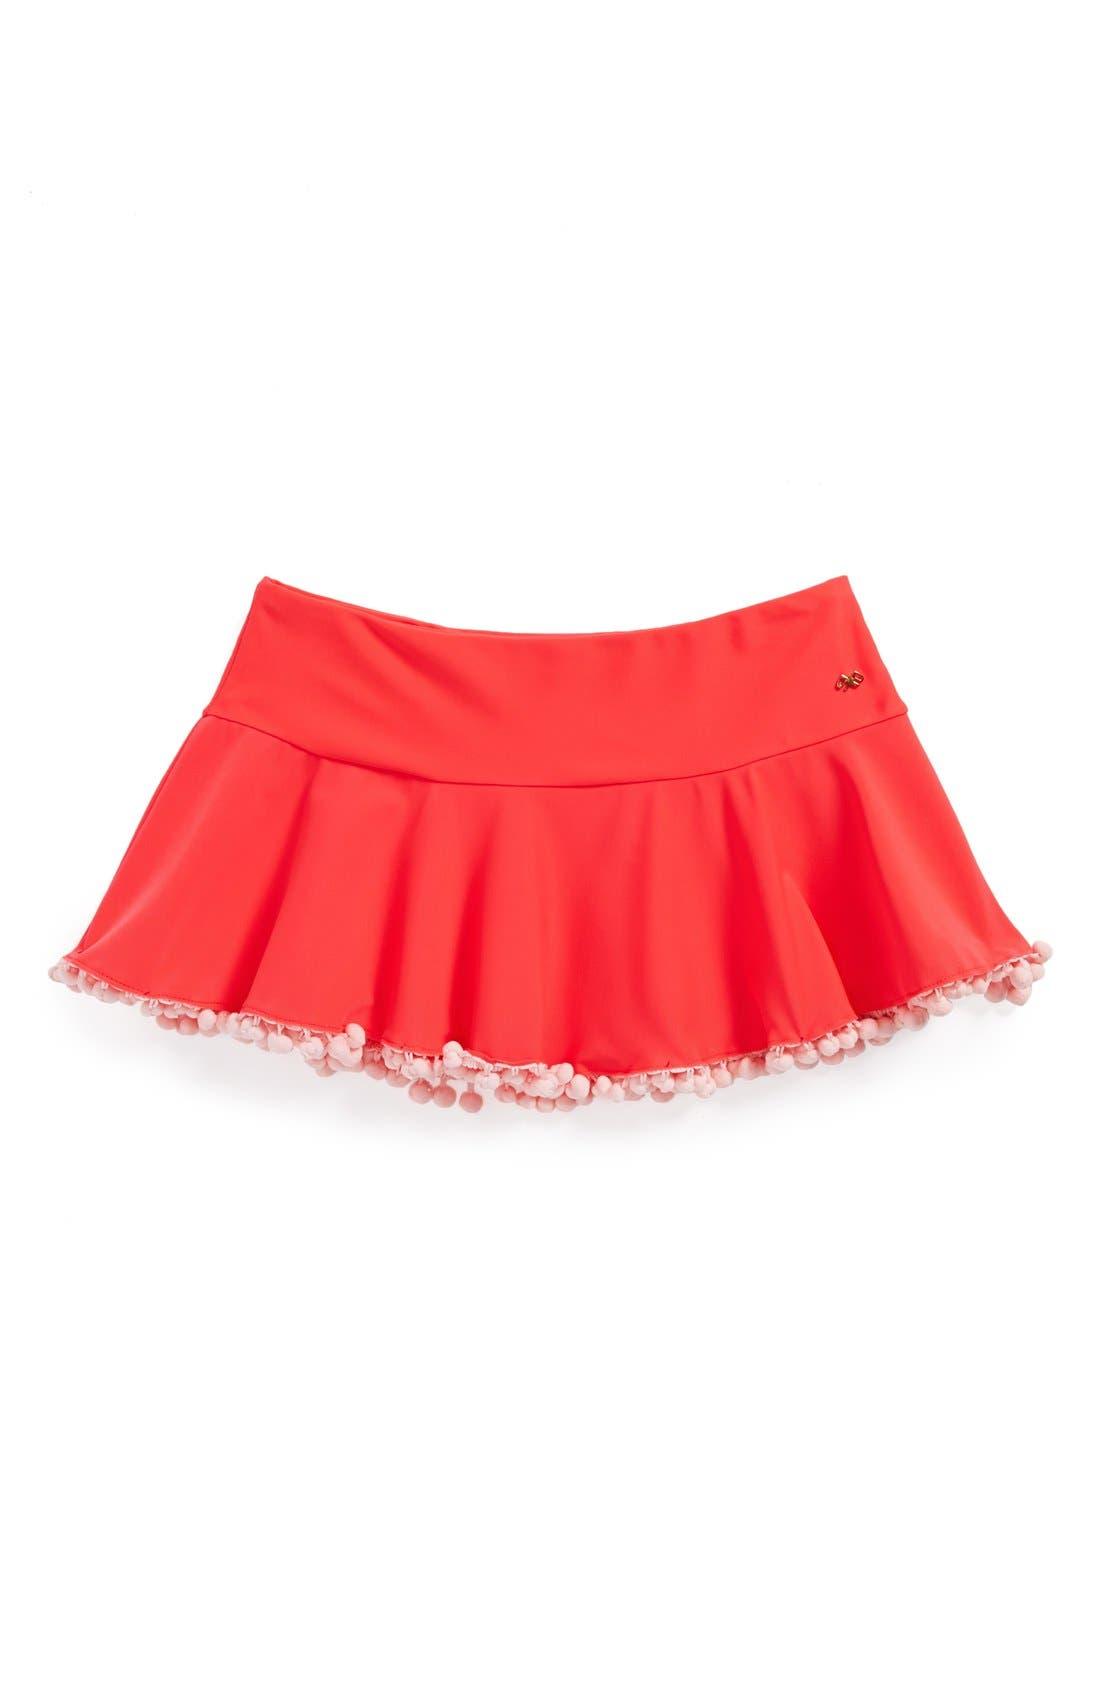 Main Image - PilyQ Cover-Up Skirt (Little Girls & Big Girls)